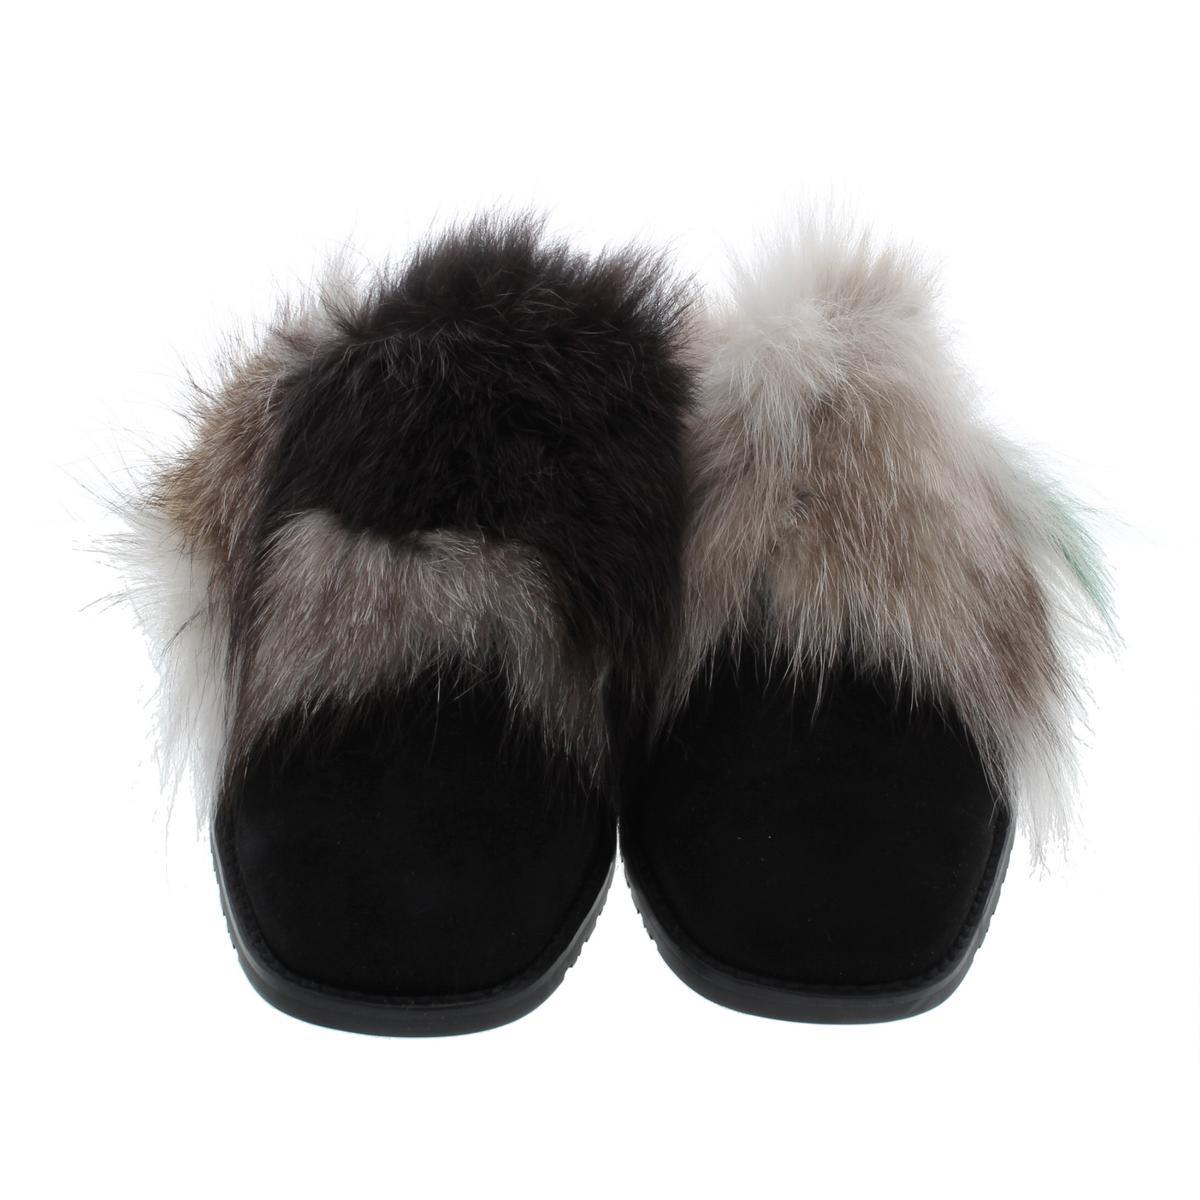 Stuart-Weitzman-Womens-Furgetit-Suede-Fox-Fur-Slide-Mules-Shoes-BHFO-8240 thumbnail 8